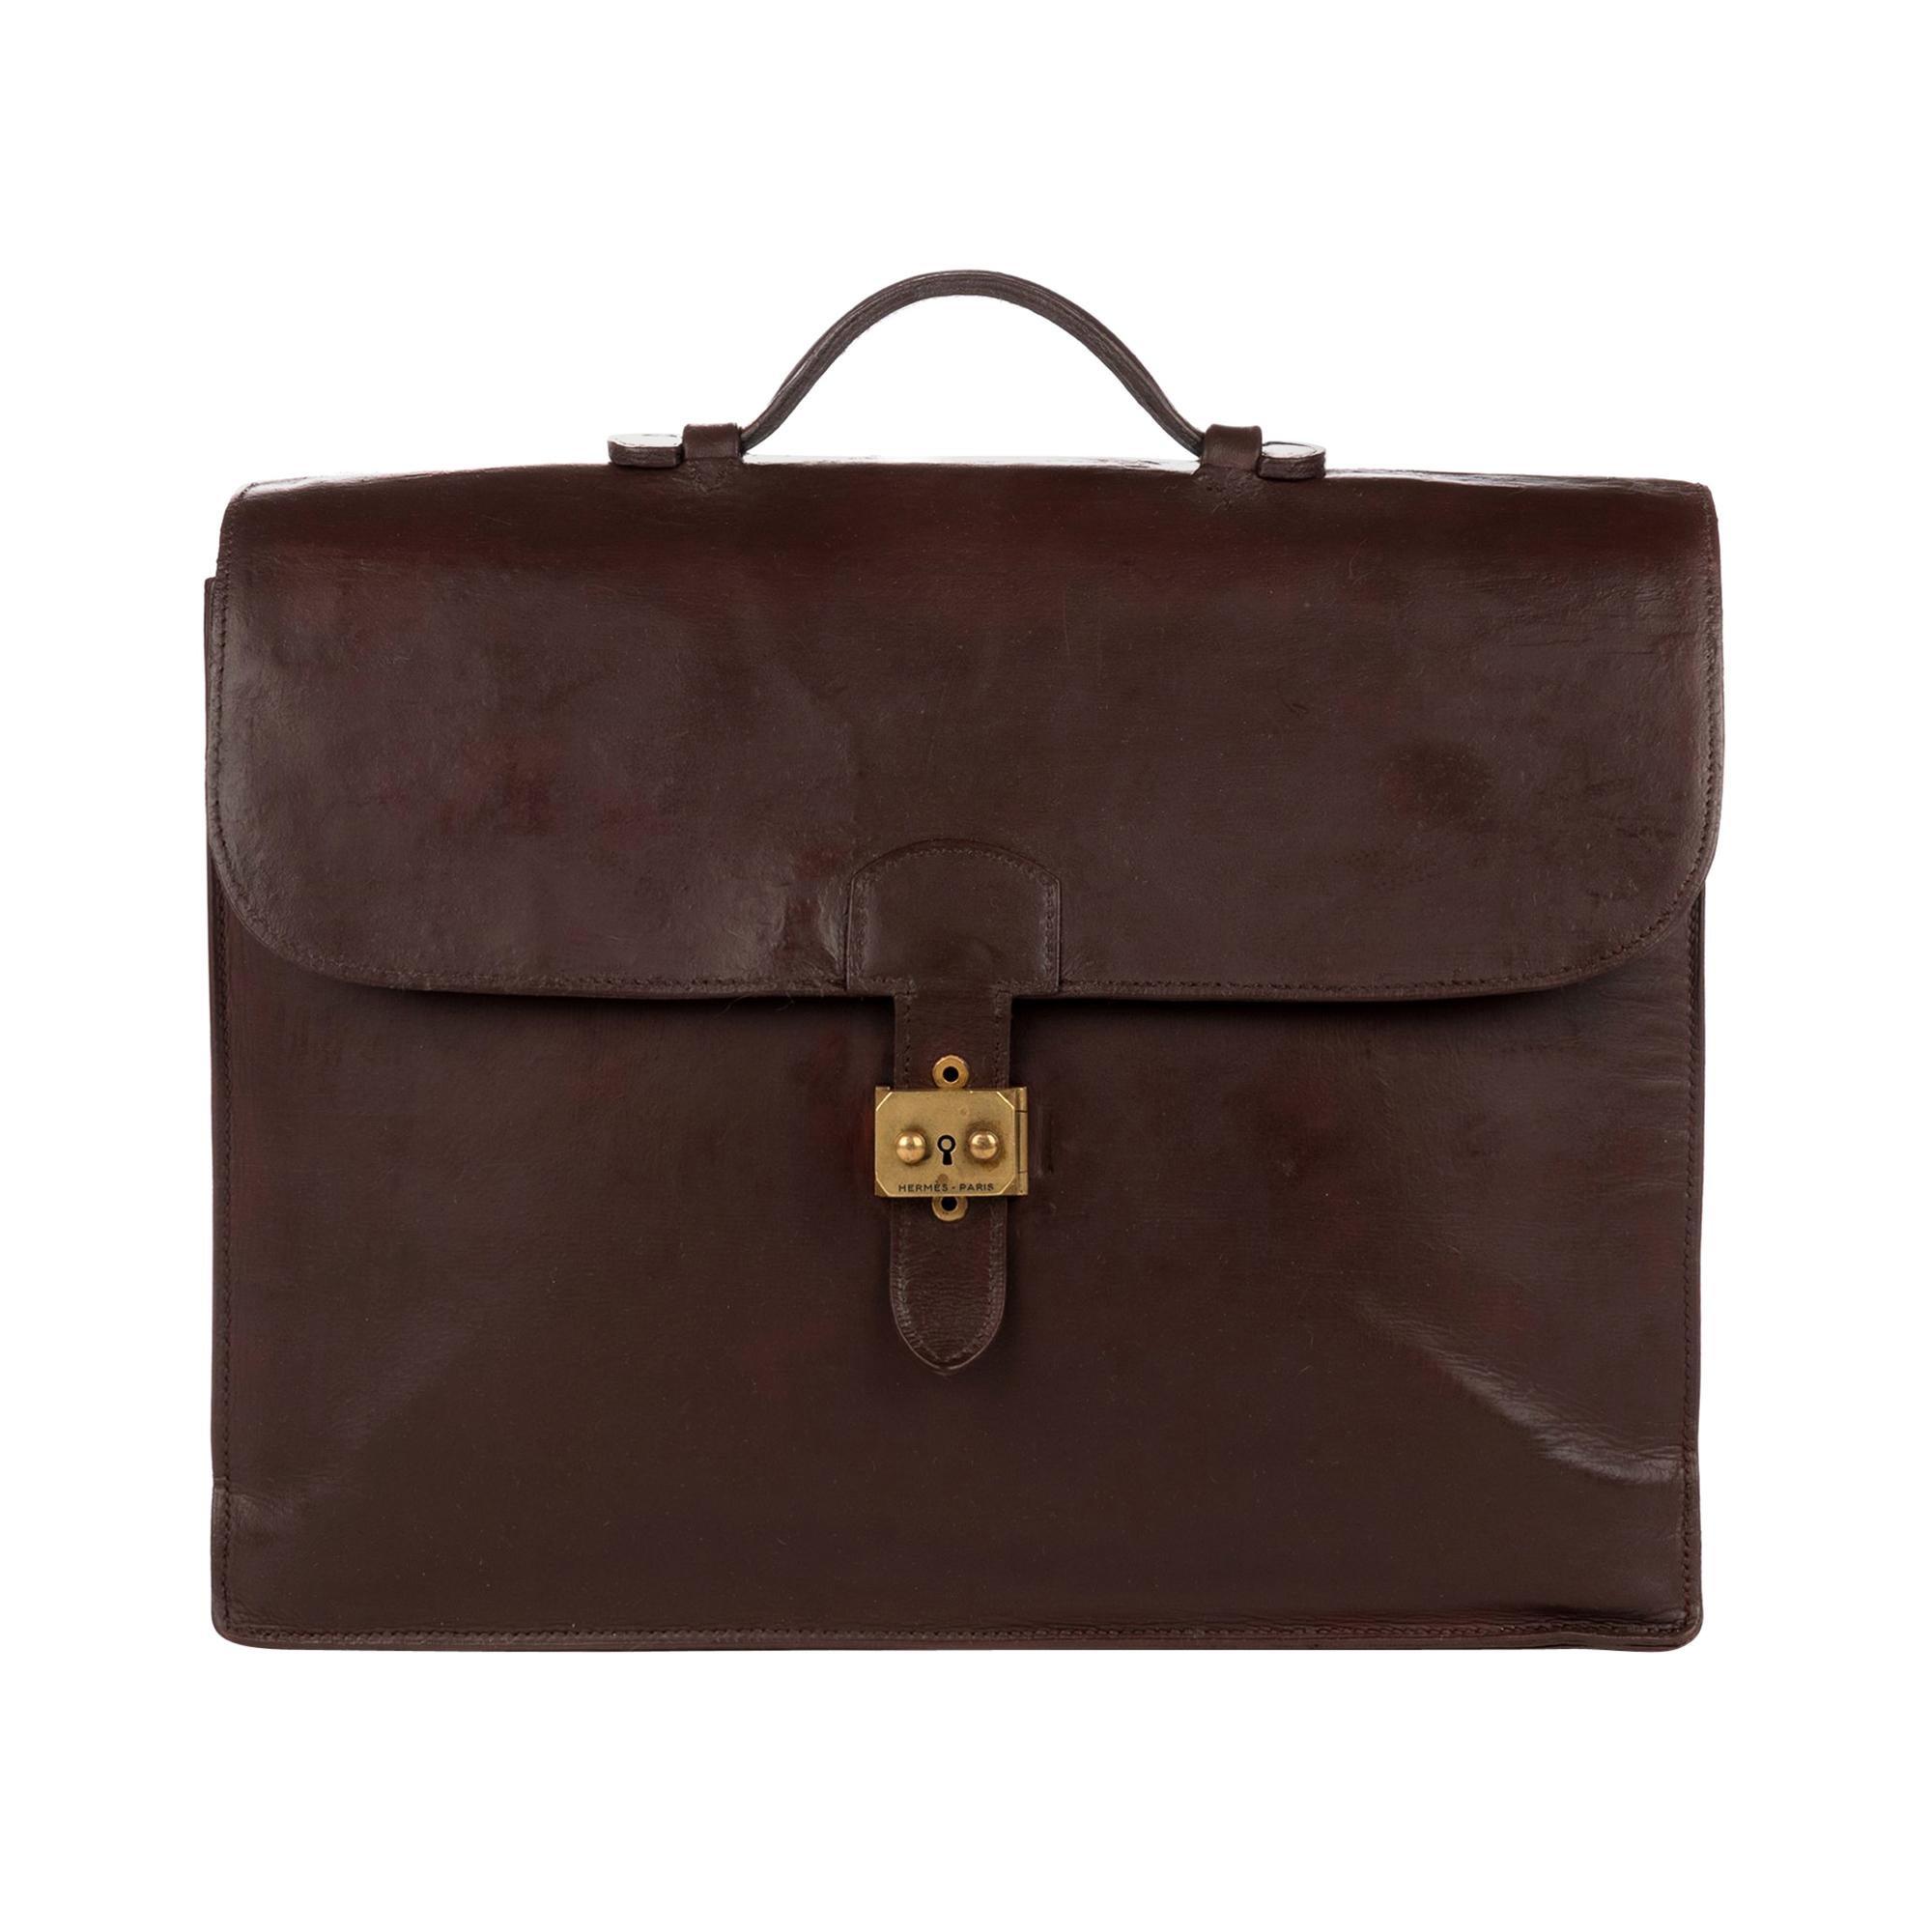 d242bf5148 Vintage Hermès Handbags and Purses - 2